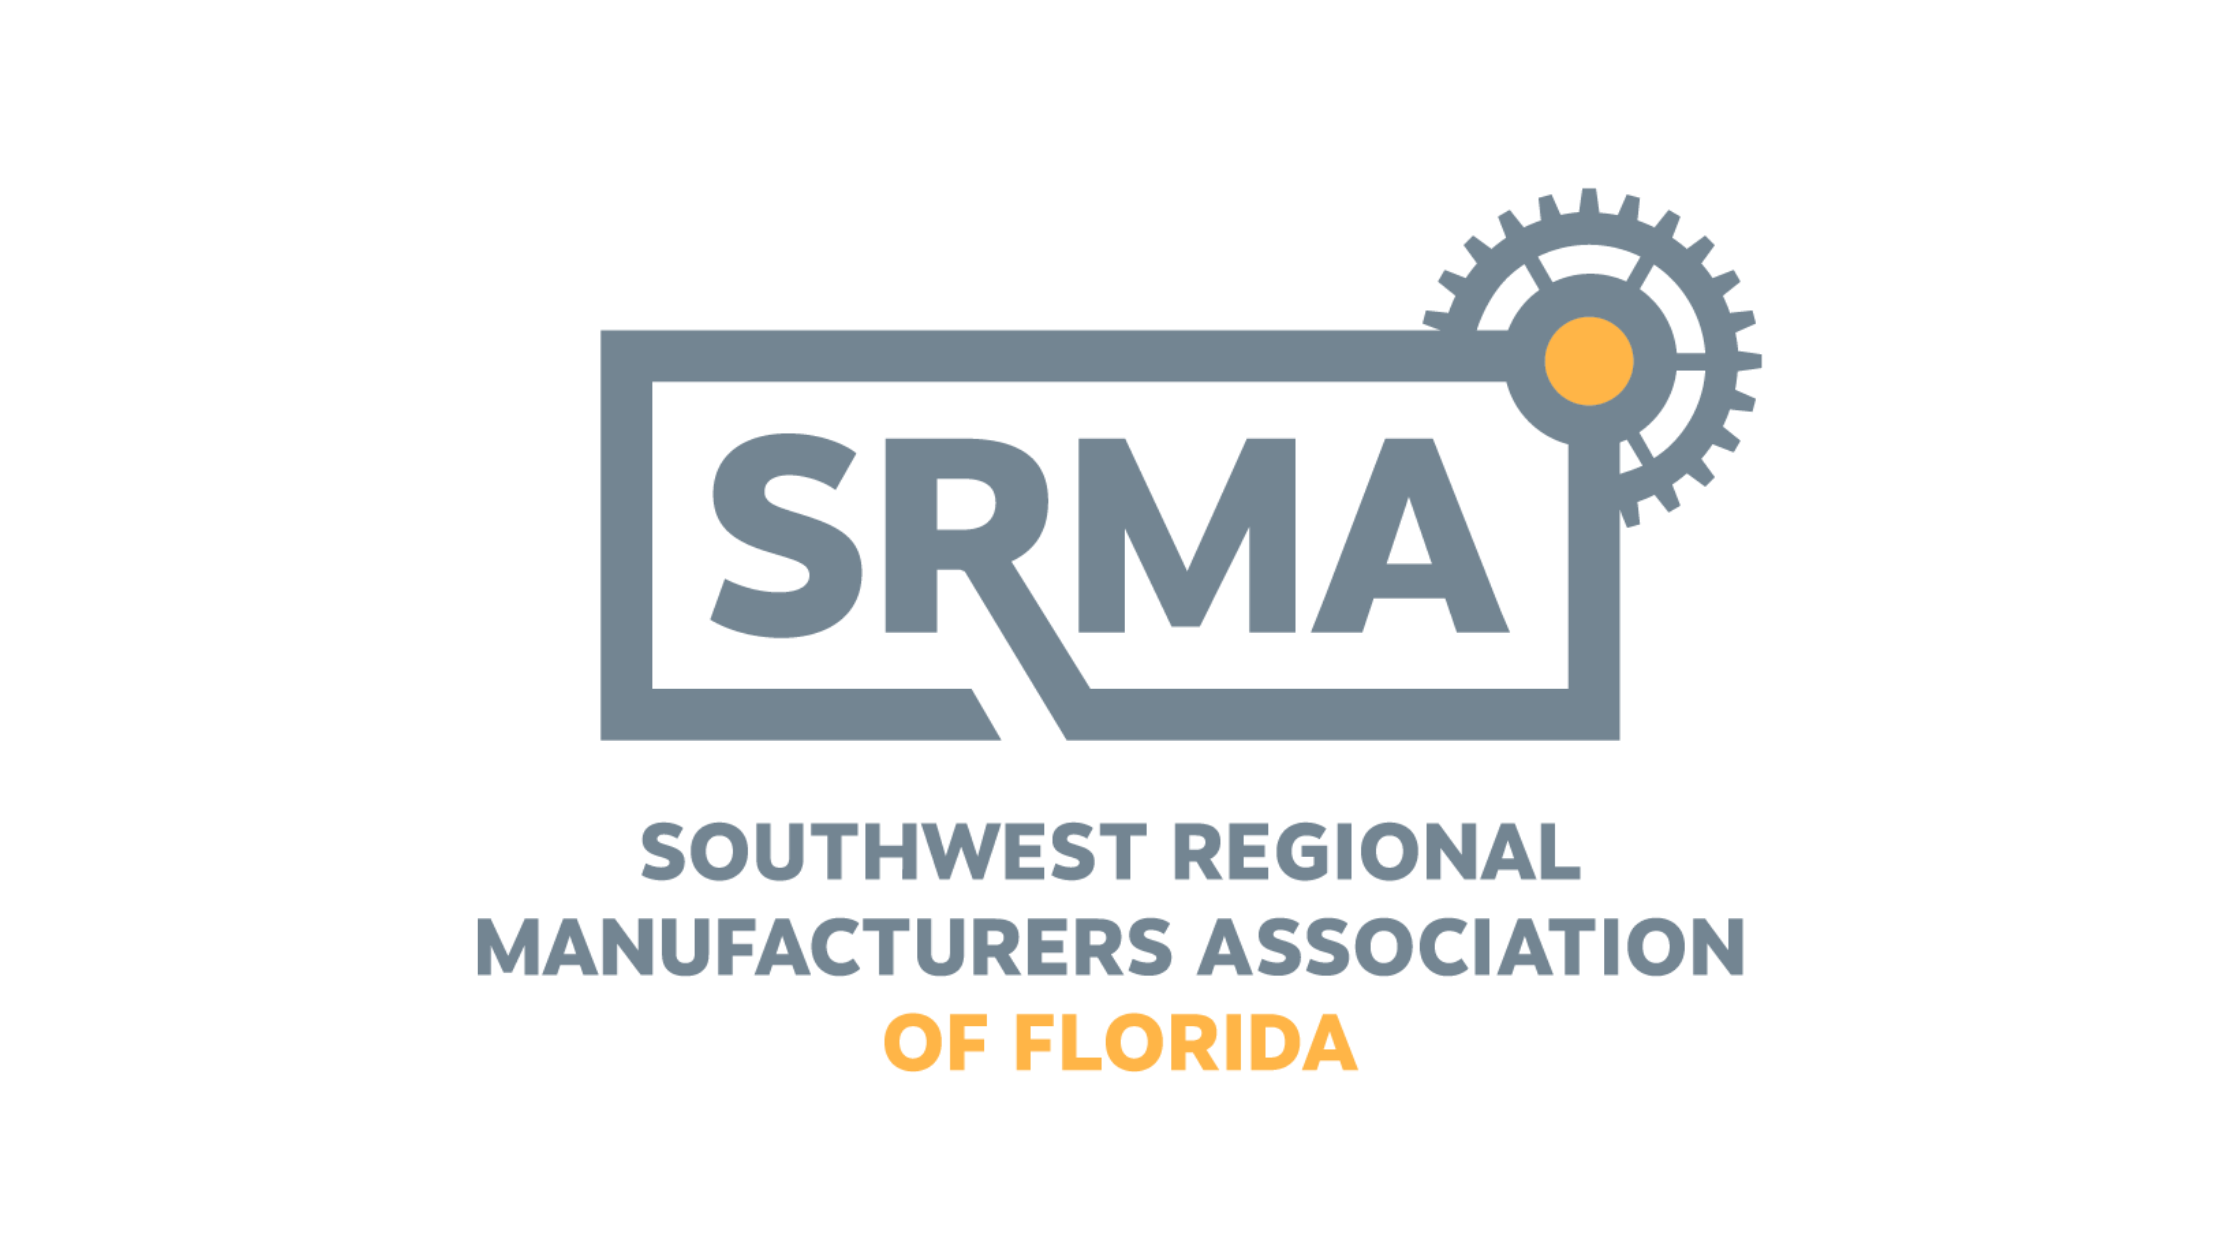 Strategic Personnel Management is the topic for Southwest Regional Manufacturers Association's April 21st webinar